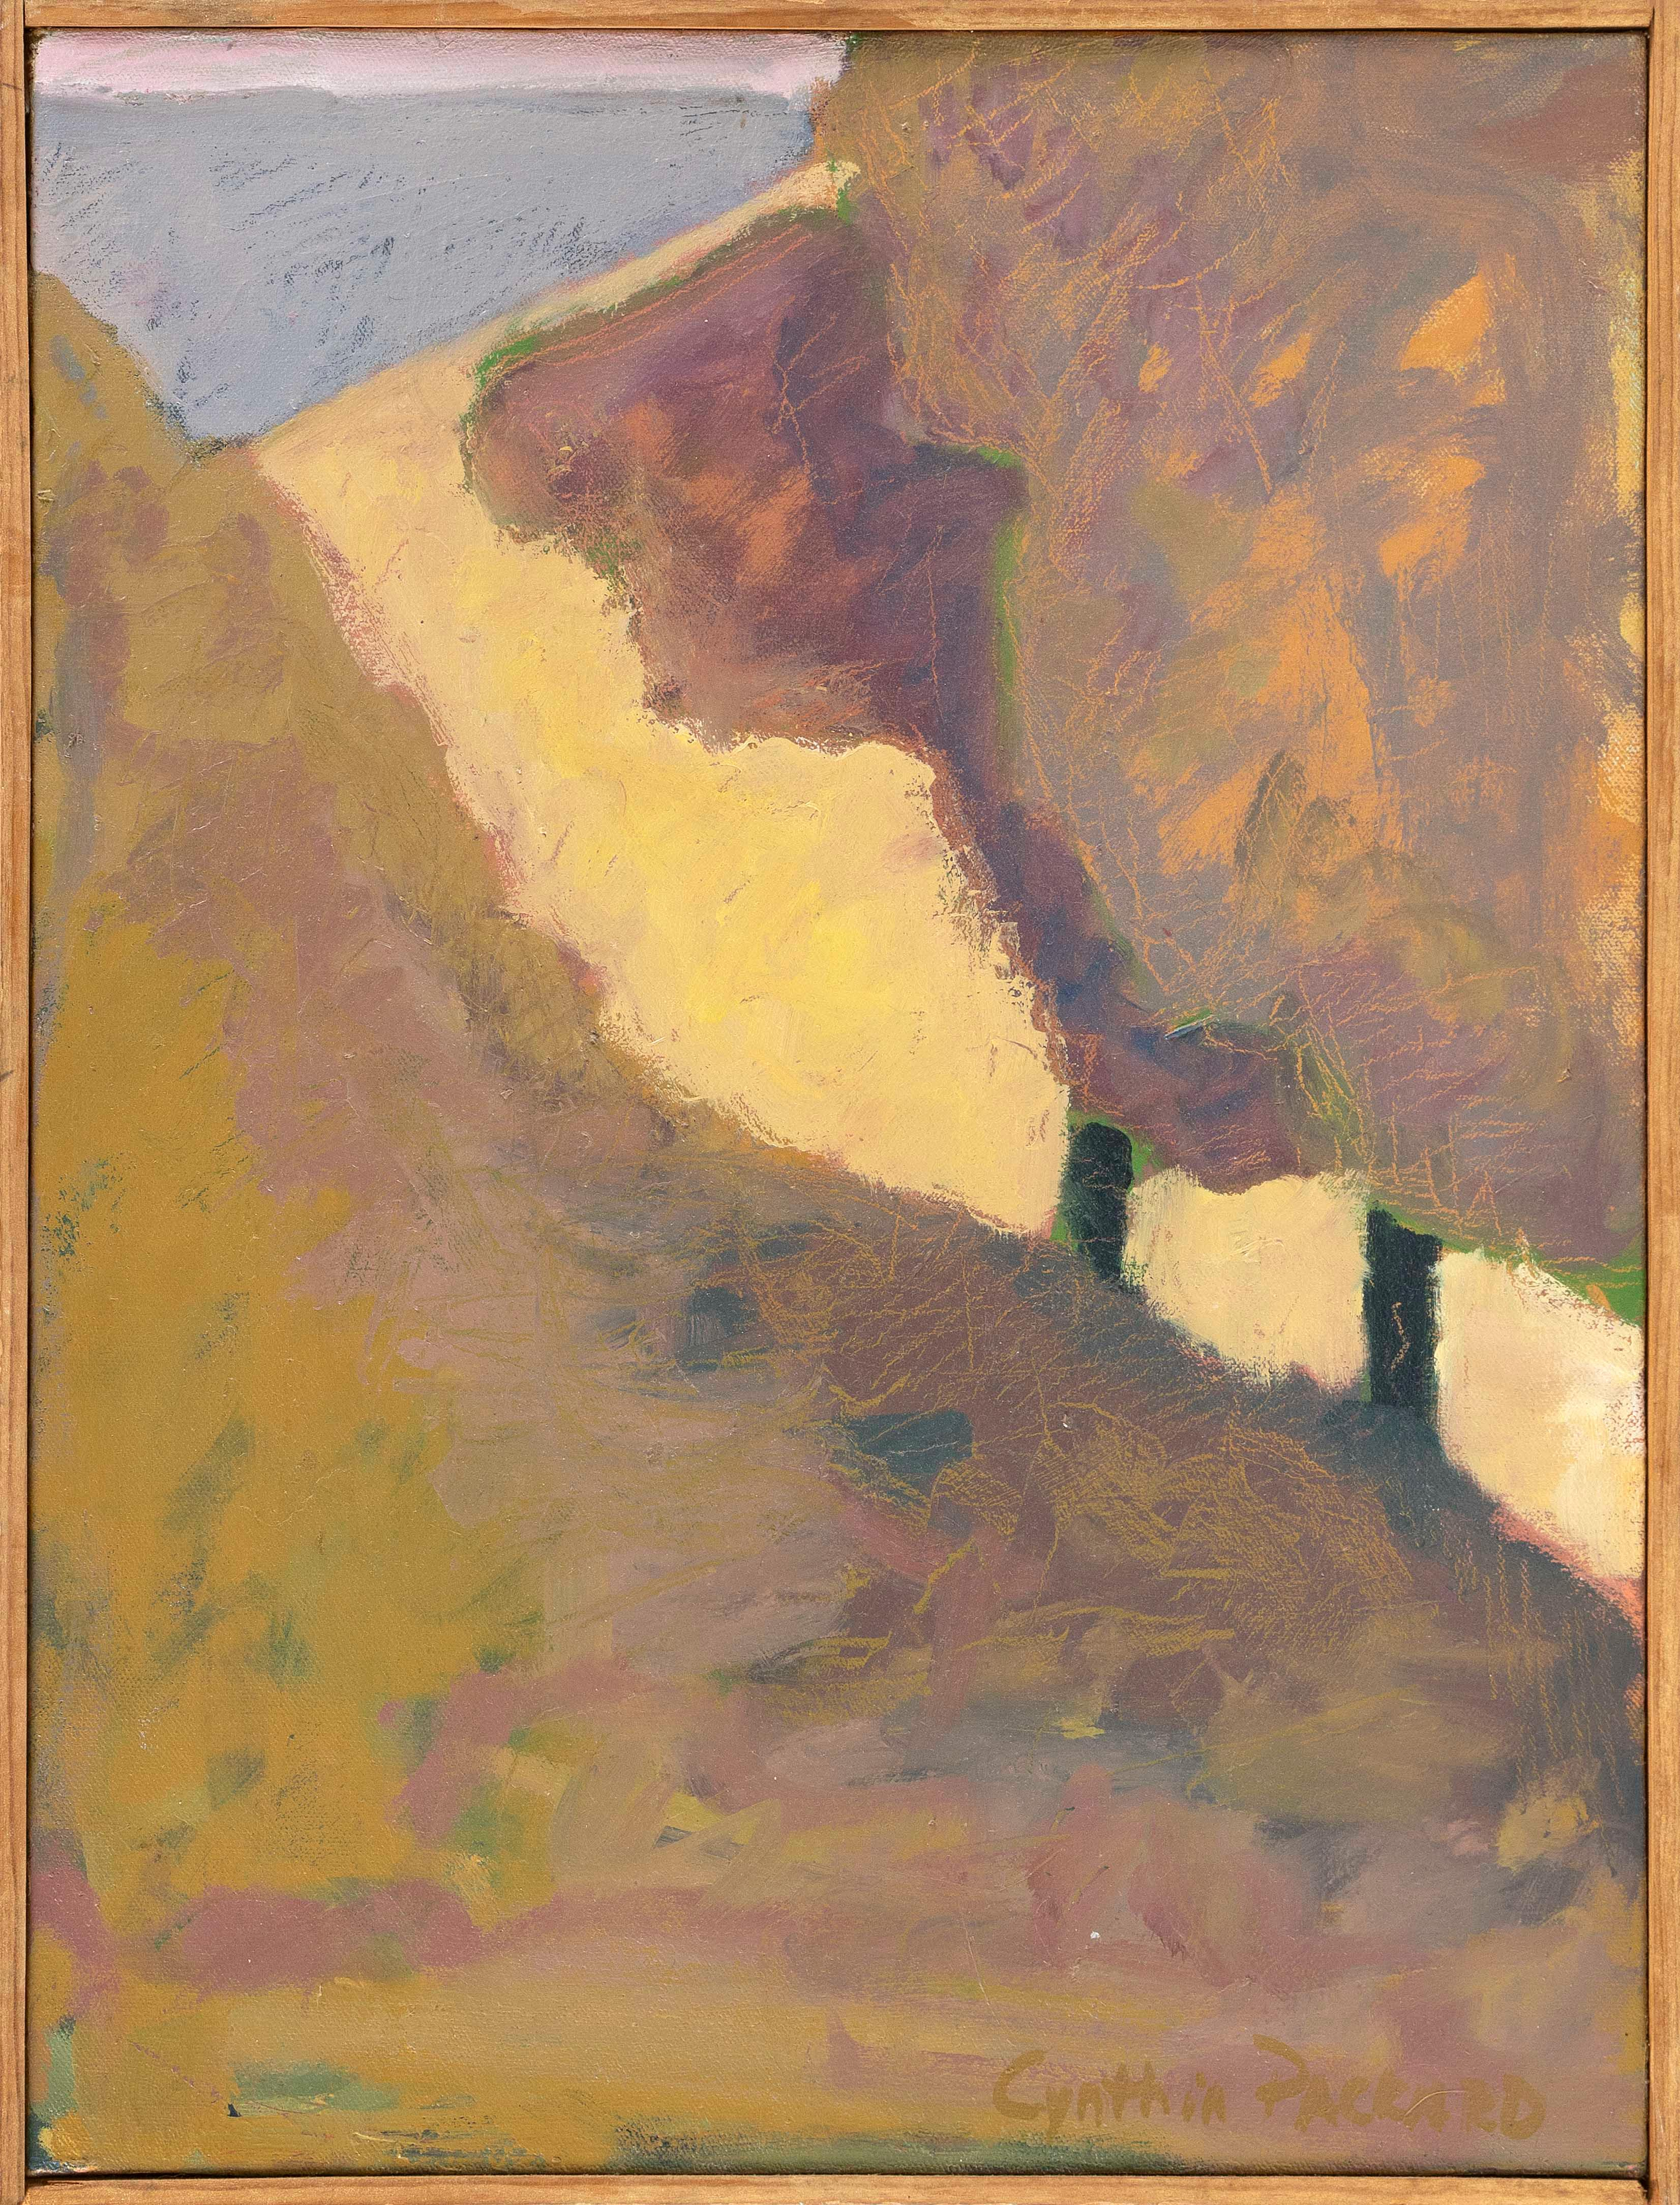 "CYNTHIA PACKARD (Massachusetts/Florida, b. 1957), ""Yellow Field""., Oil on canvas, 14"" x 9"". Framed 14.5"" x 9.5""."